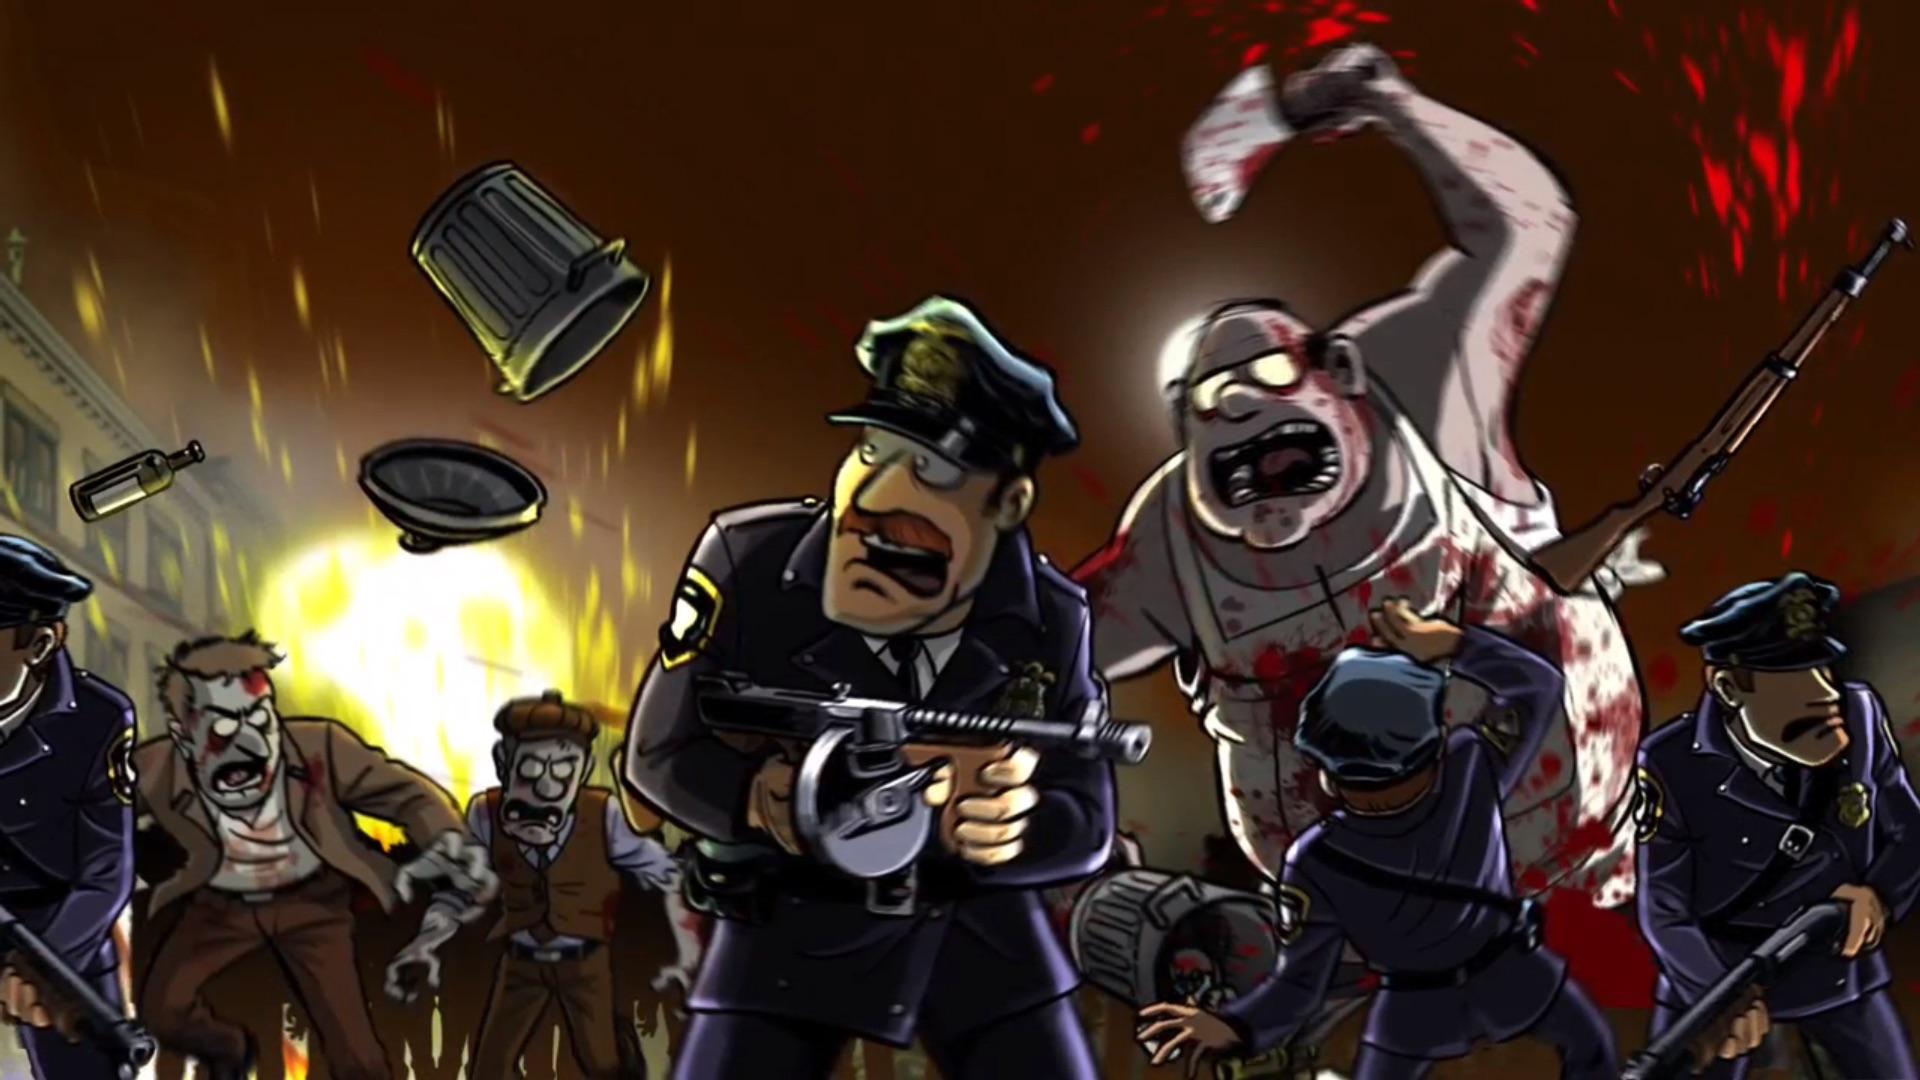 Guns, Gore & Cannoli